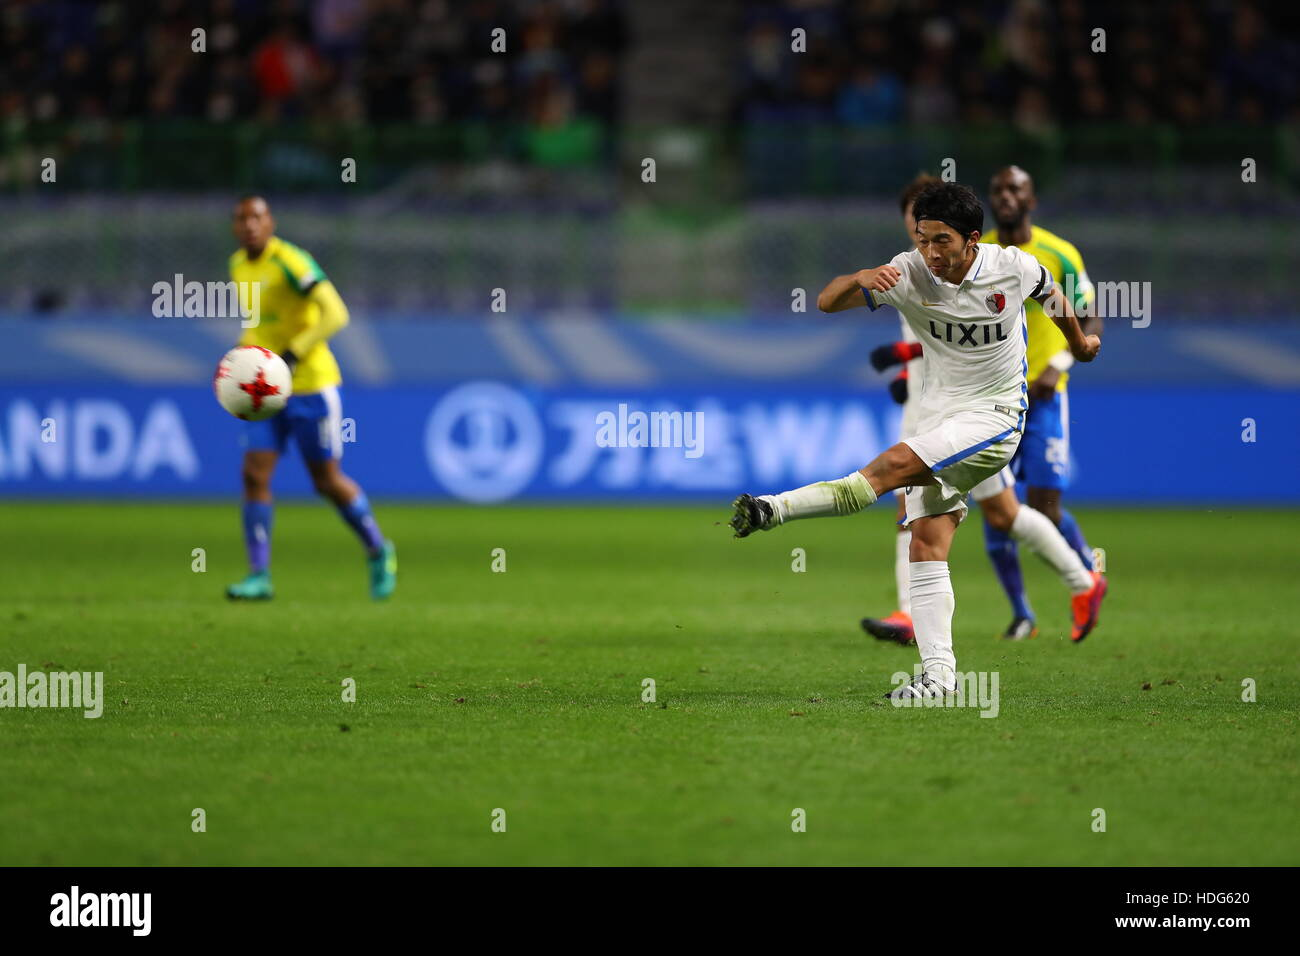 Osaka, Japan. 11th Dec, 2016. Gaku Shibasaki (Antlers) Football/Soccer : FIFA Club World Cup Quarter-final match - Stock Image